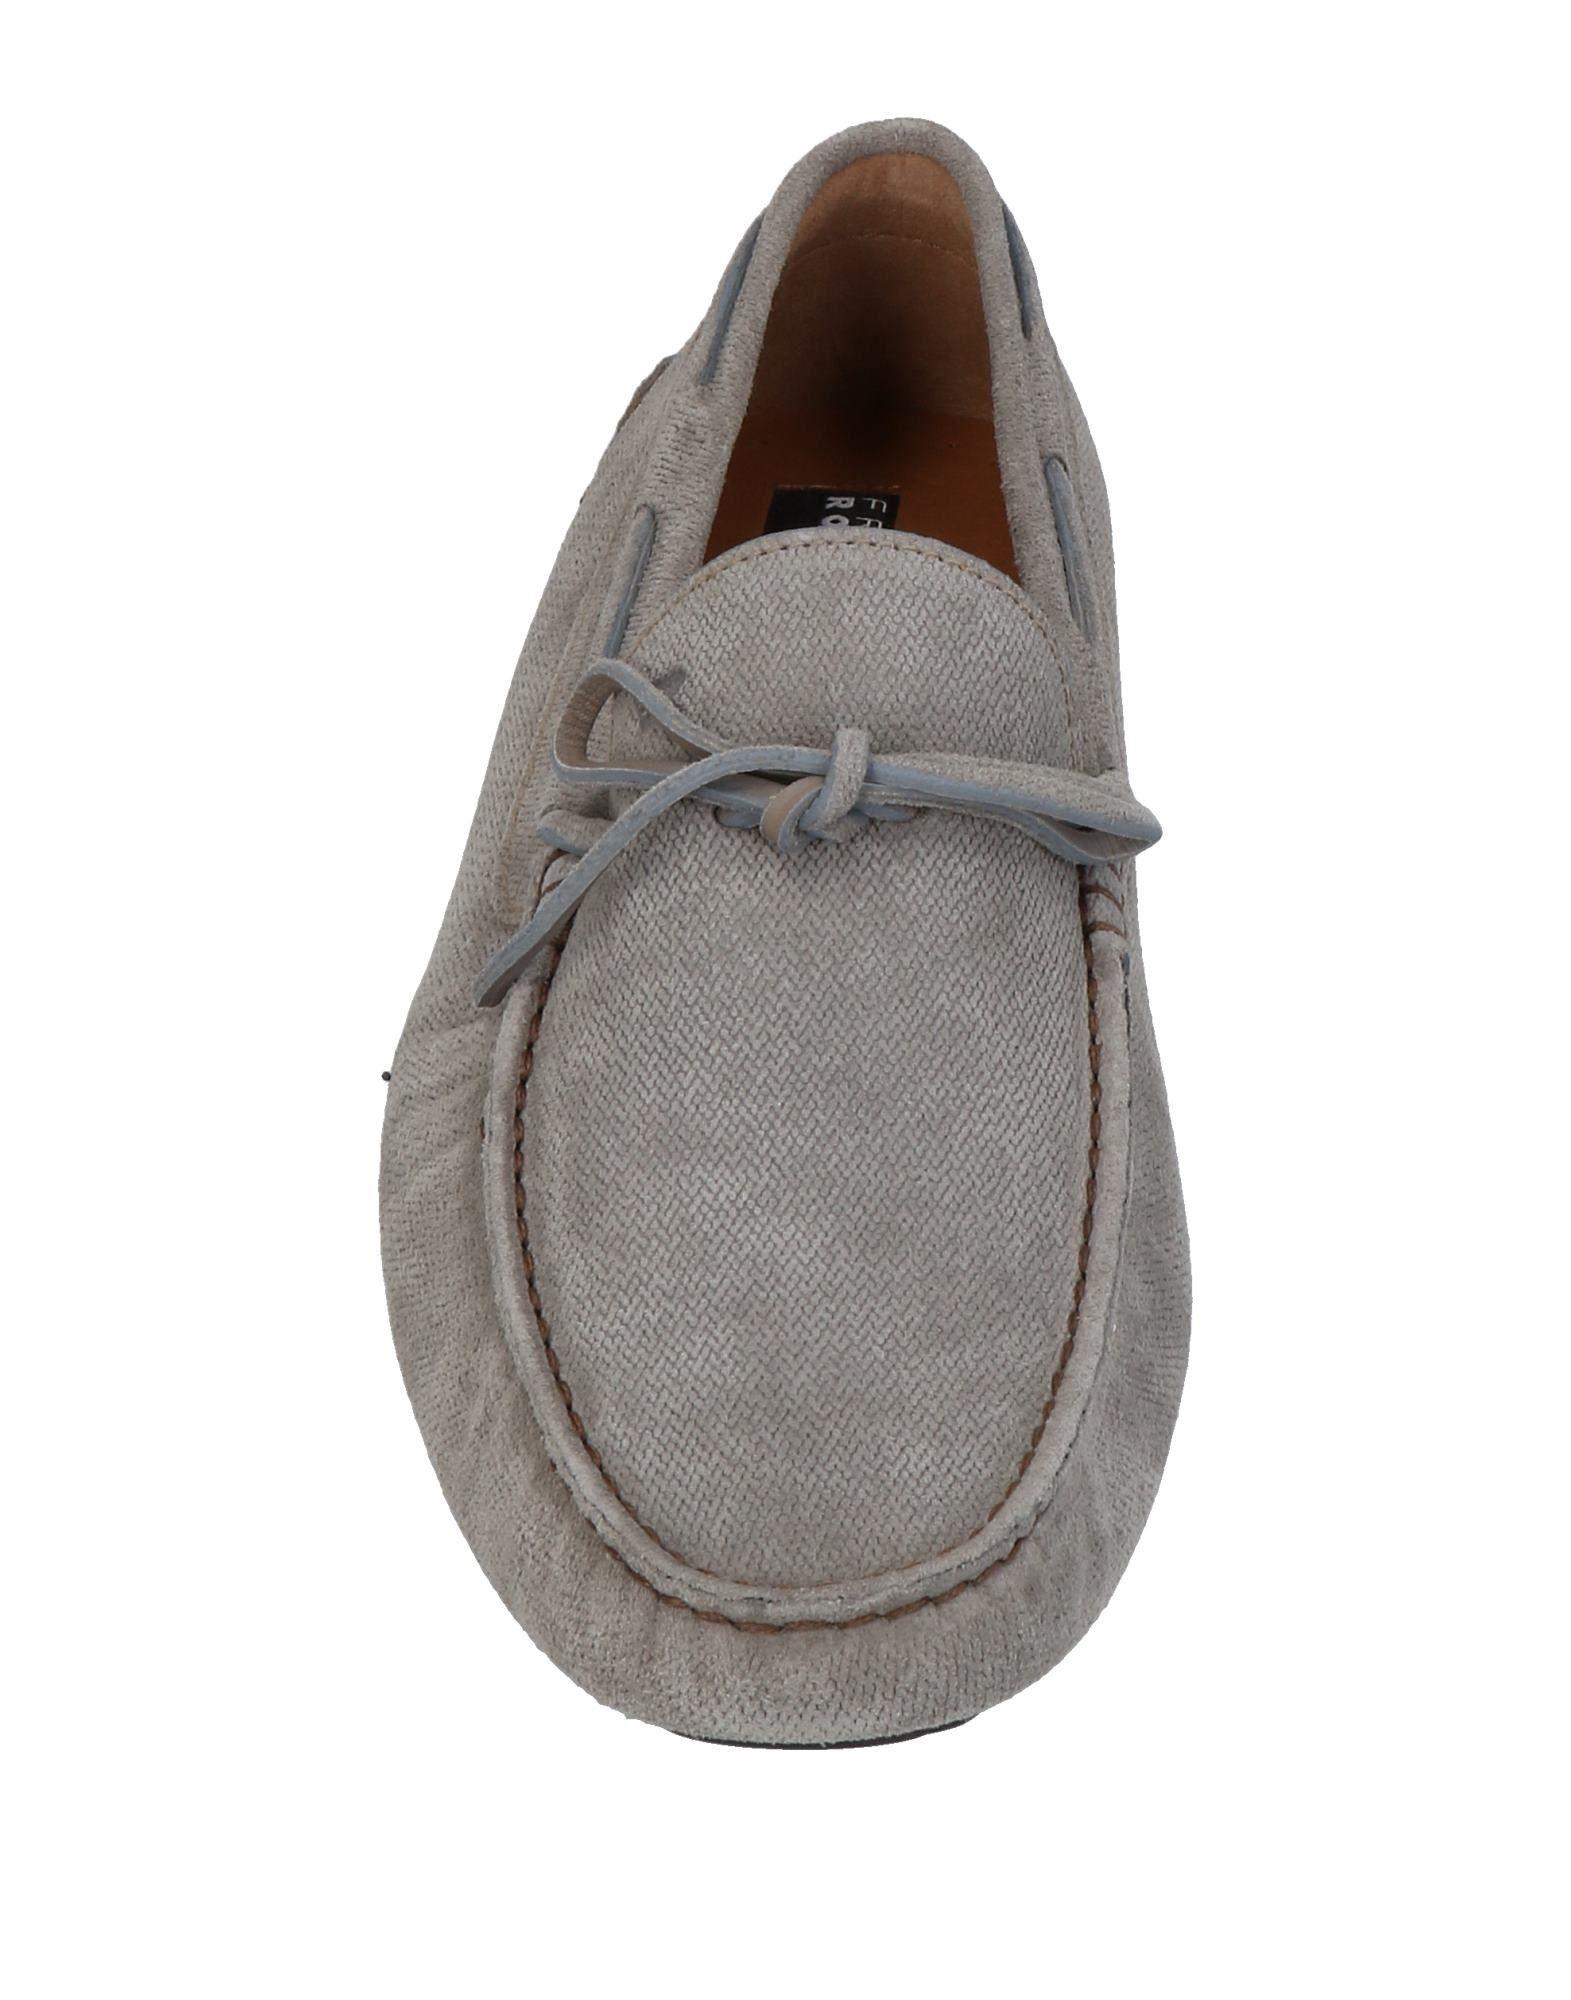 Fratelli Rossetti Mokassins Herren  Schuhe 11440665MJ Gute Qualität beliebte Schuhe  7b9e0f